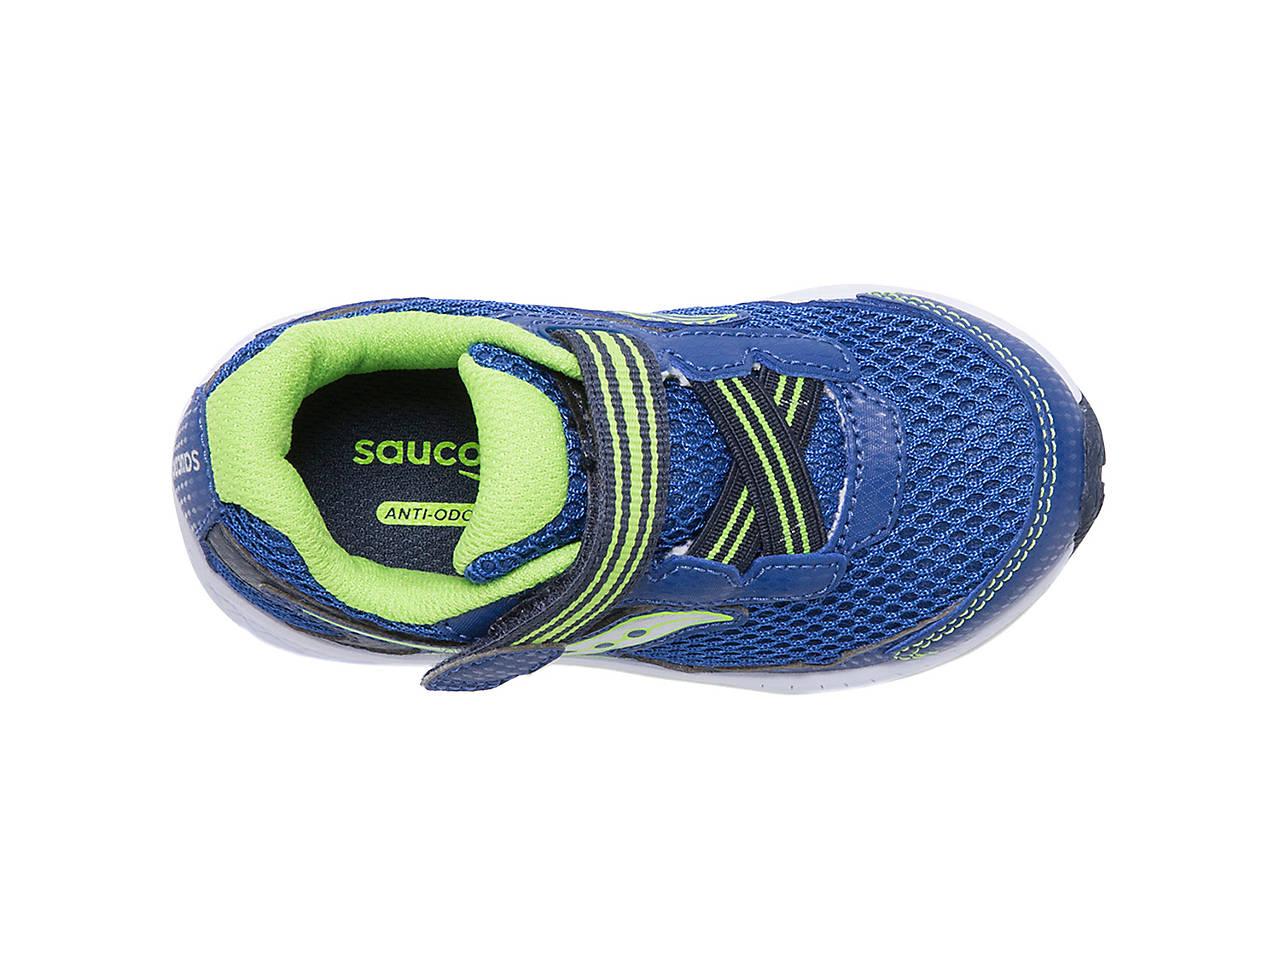 bbfaa1e539c9 Saucony Ride 10 JR Infant   Toddler Sneaker Kids Shoes